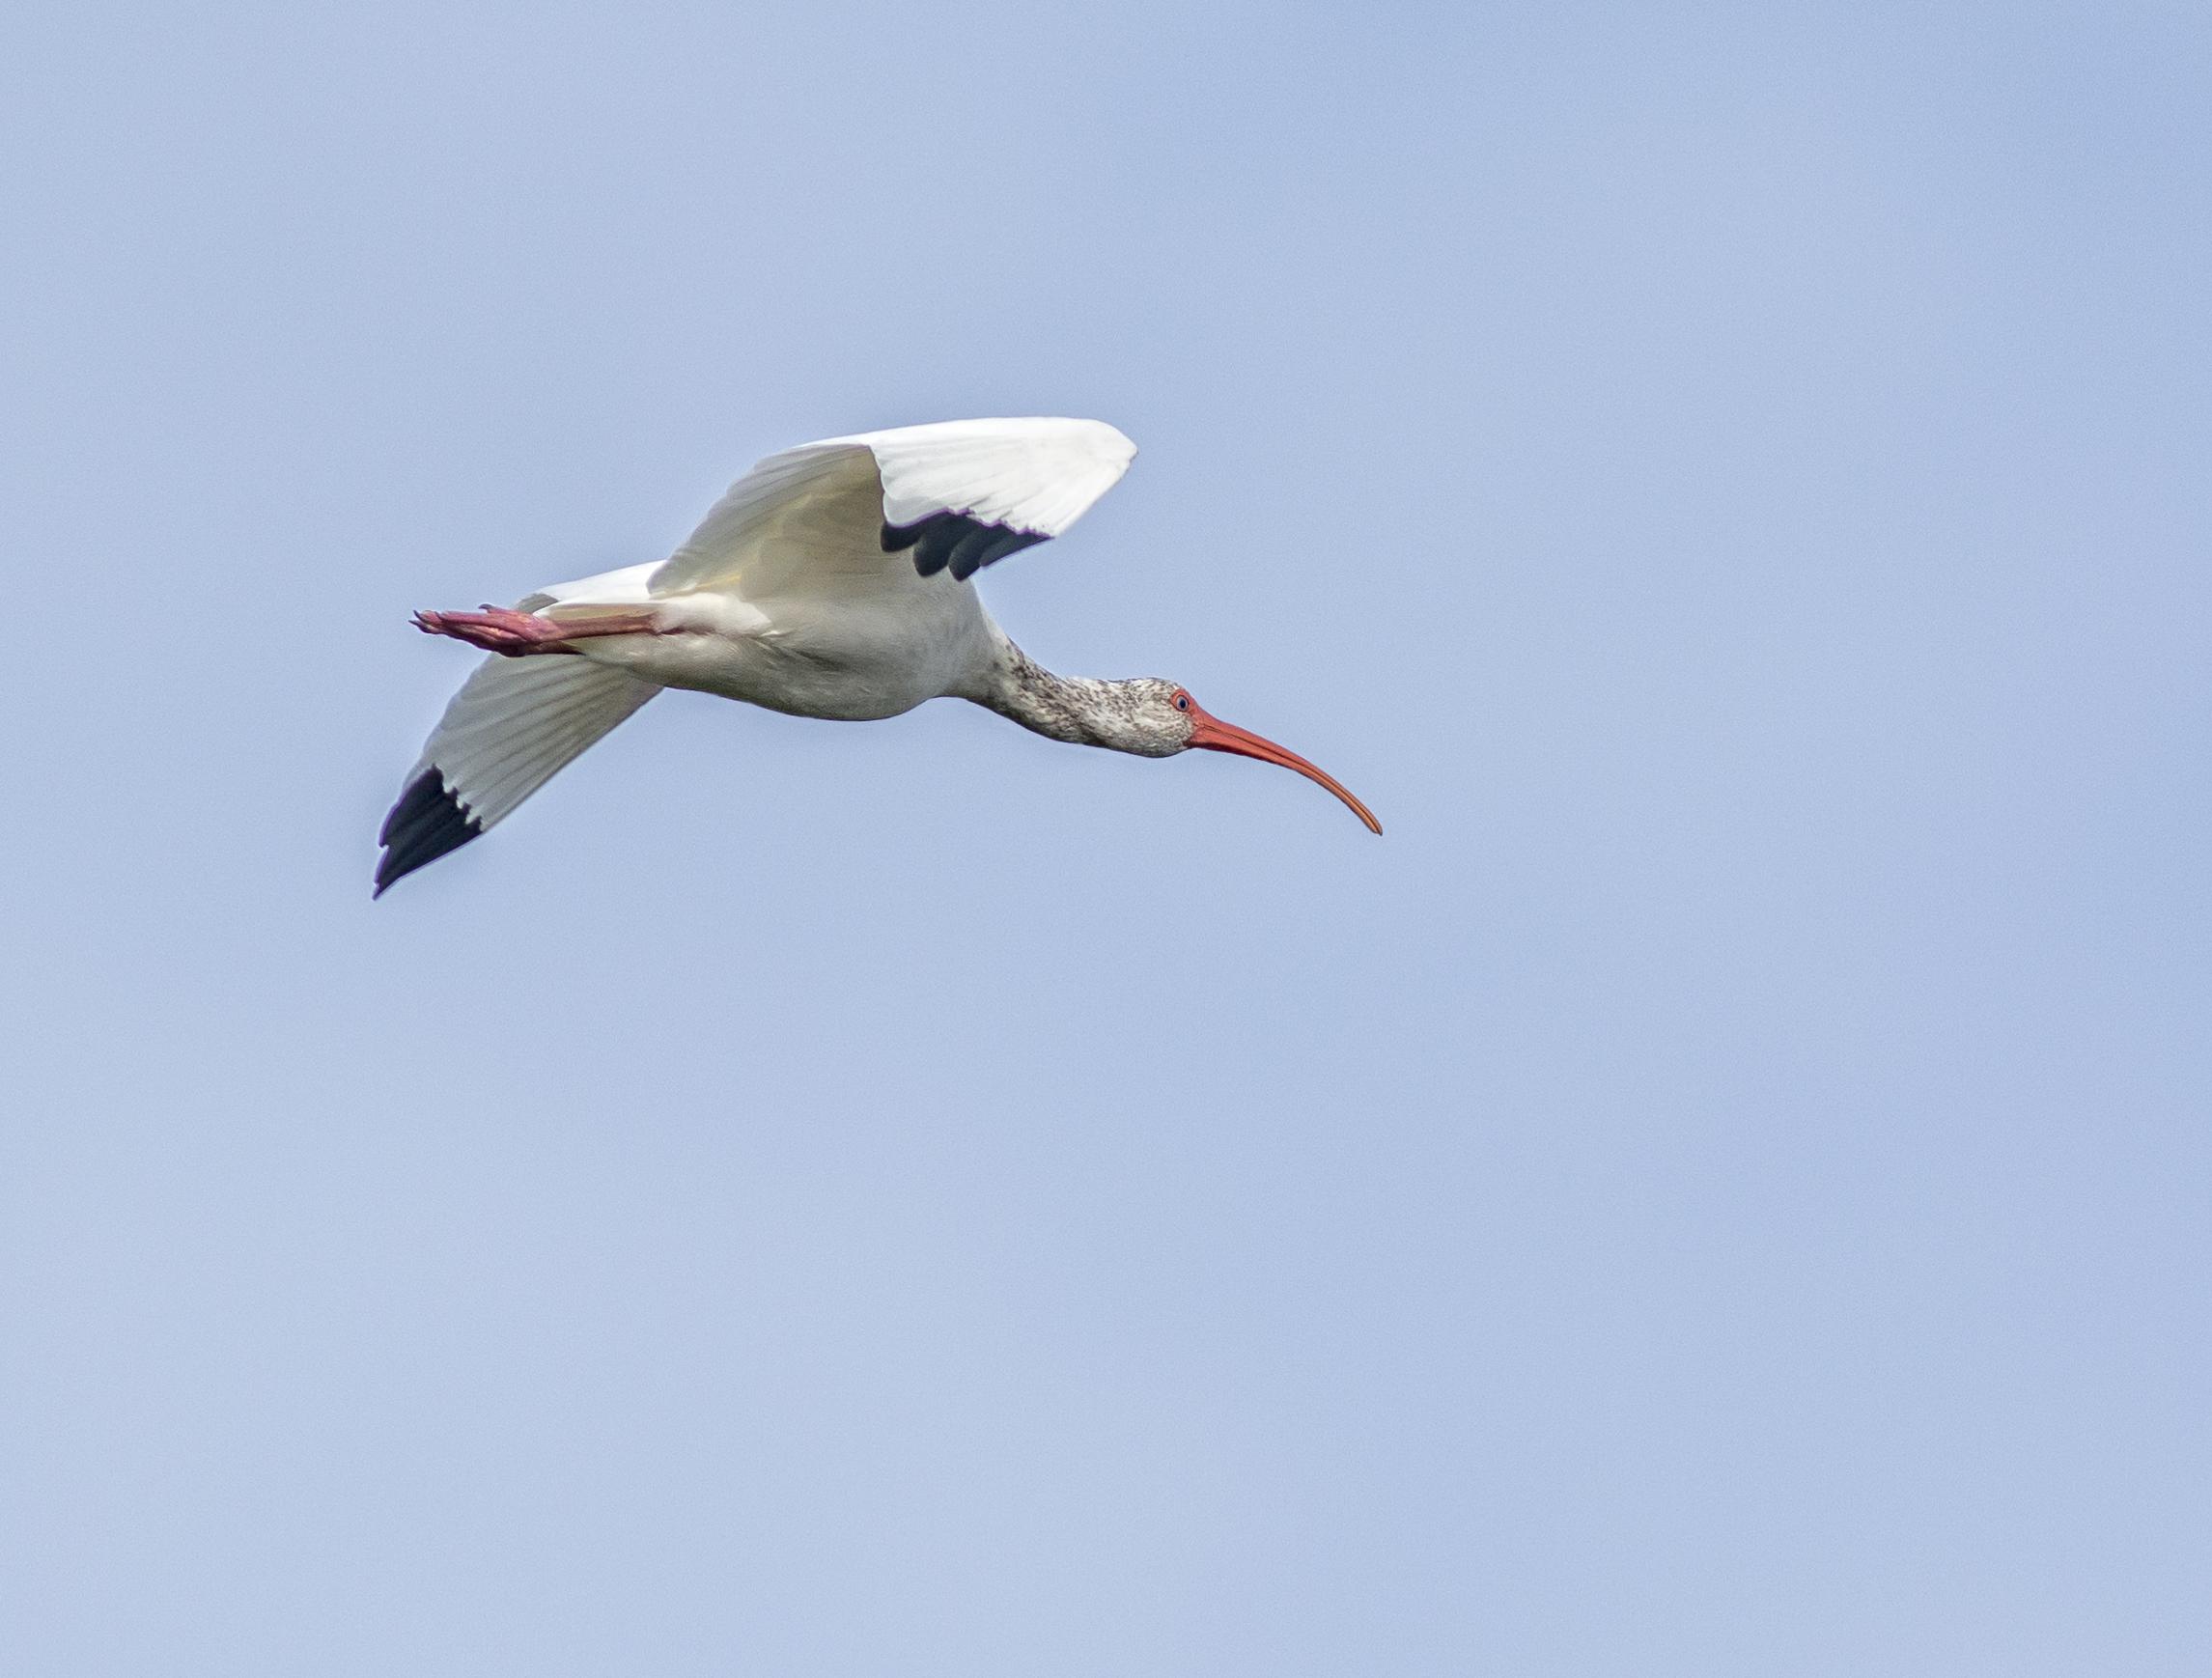 Vit ibis